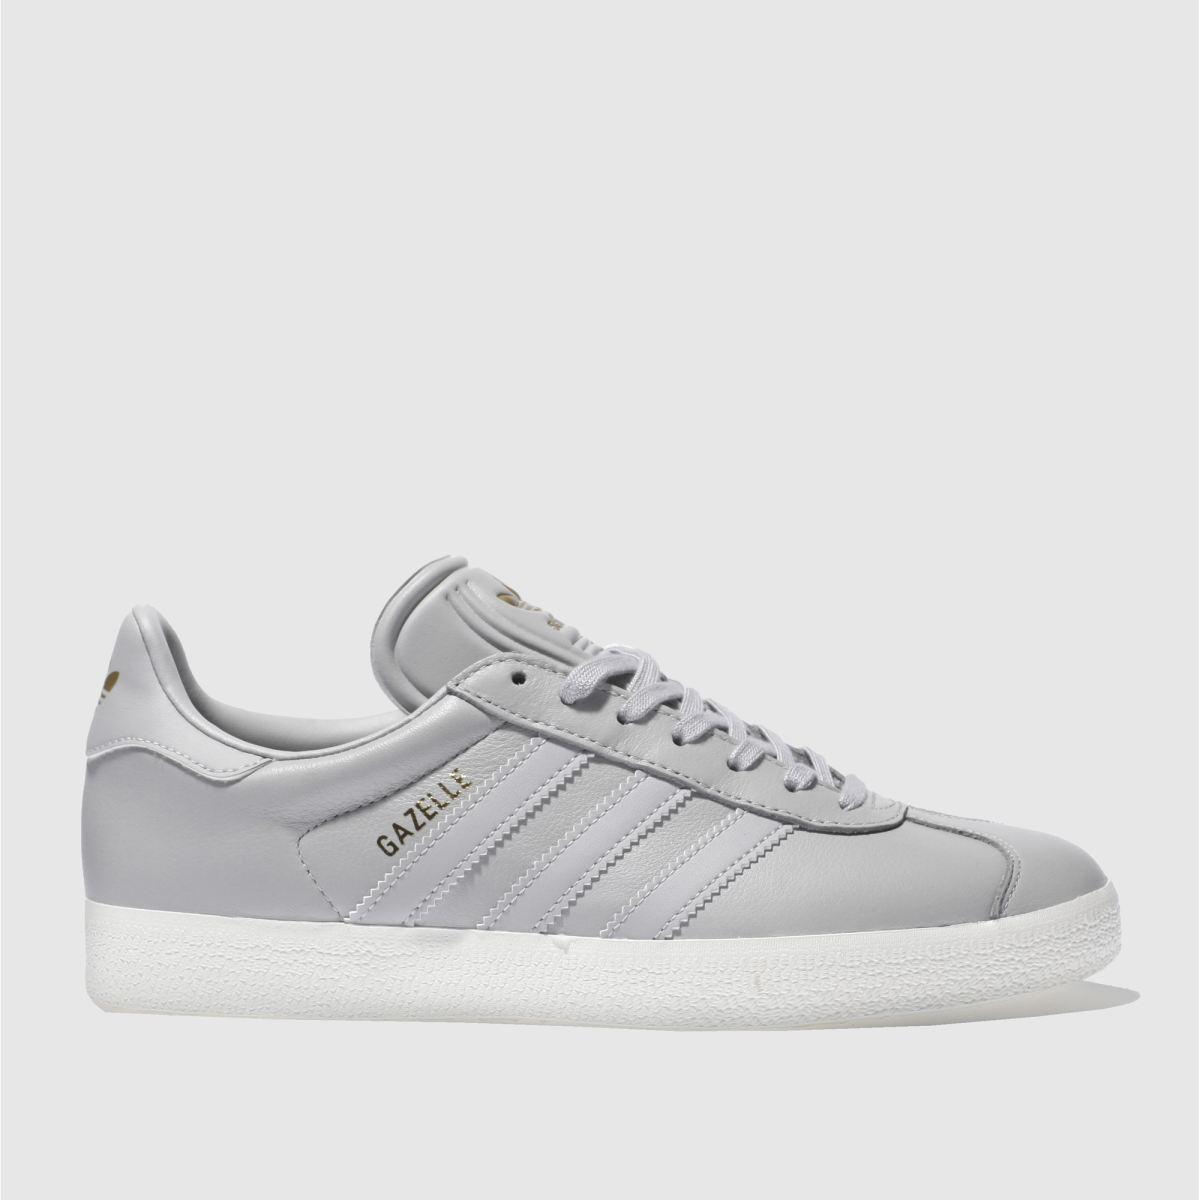 Adidas Light Grey Gazelle Leather Trainers